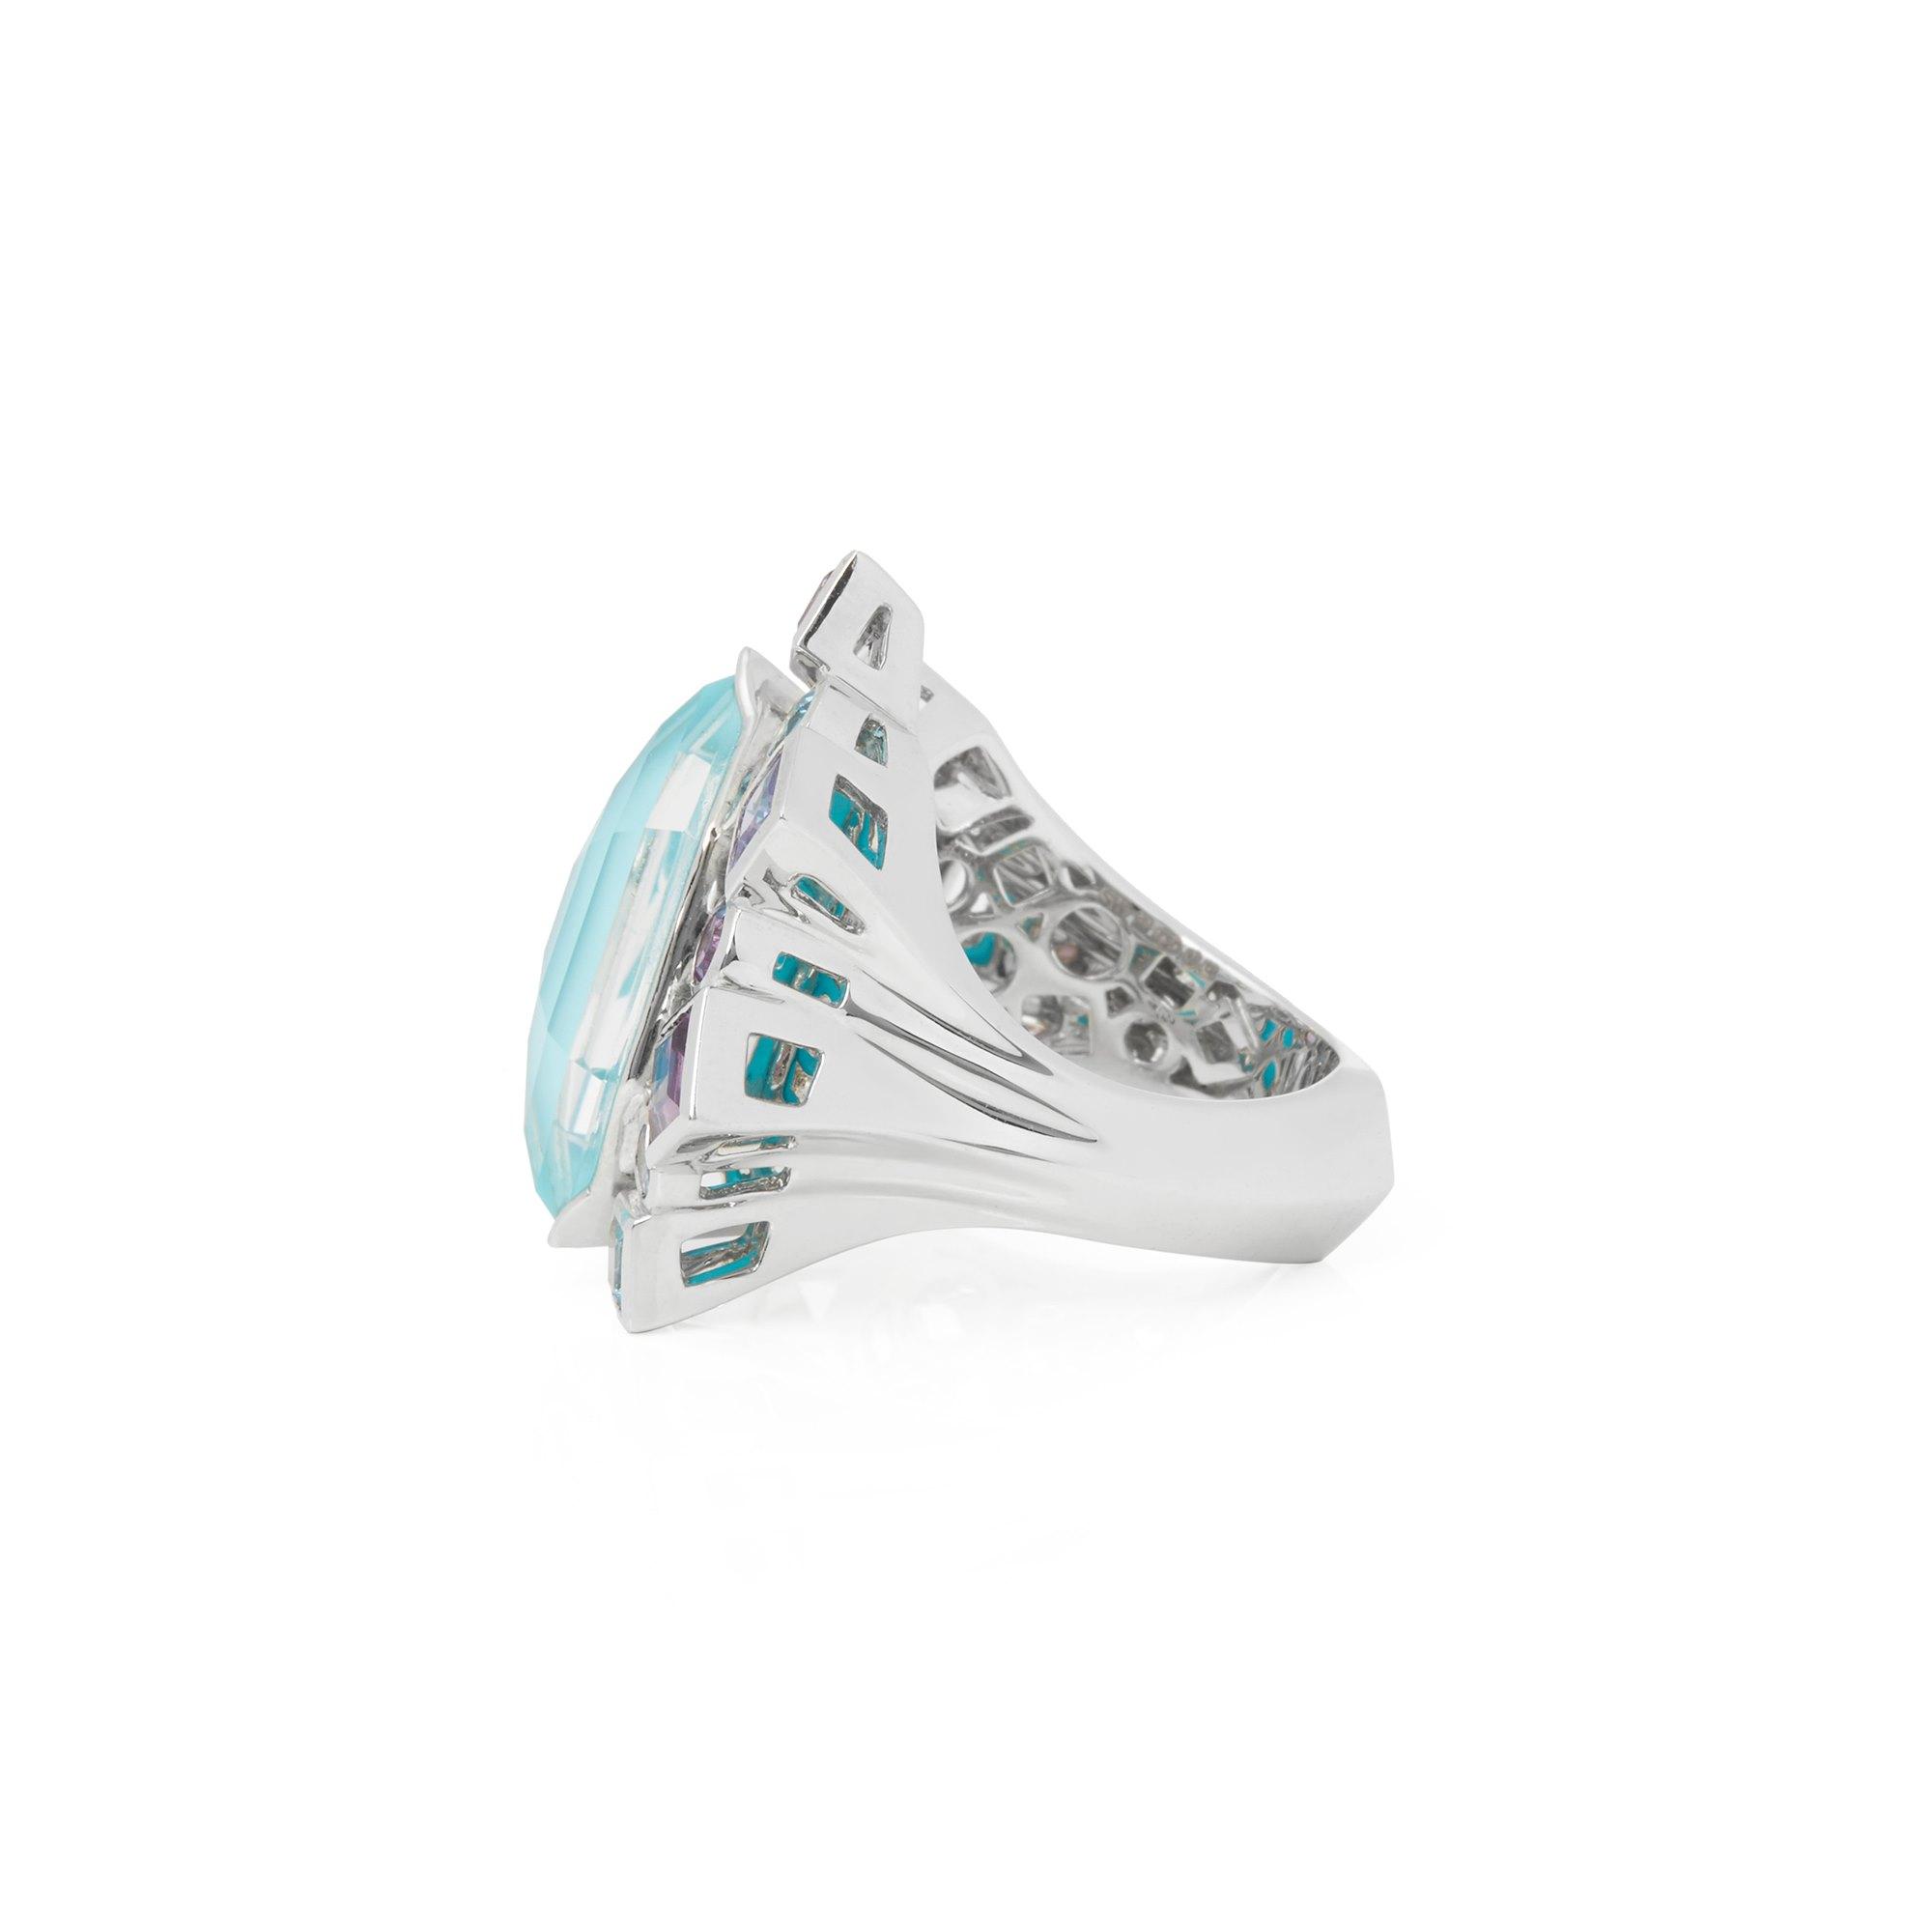 Stephen Webster 18k White Gold Crystal Haze Gold Struck Turquoise Open Ring